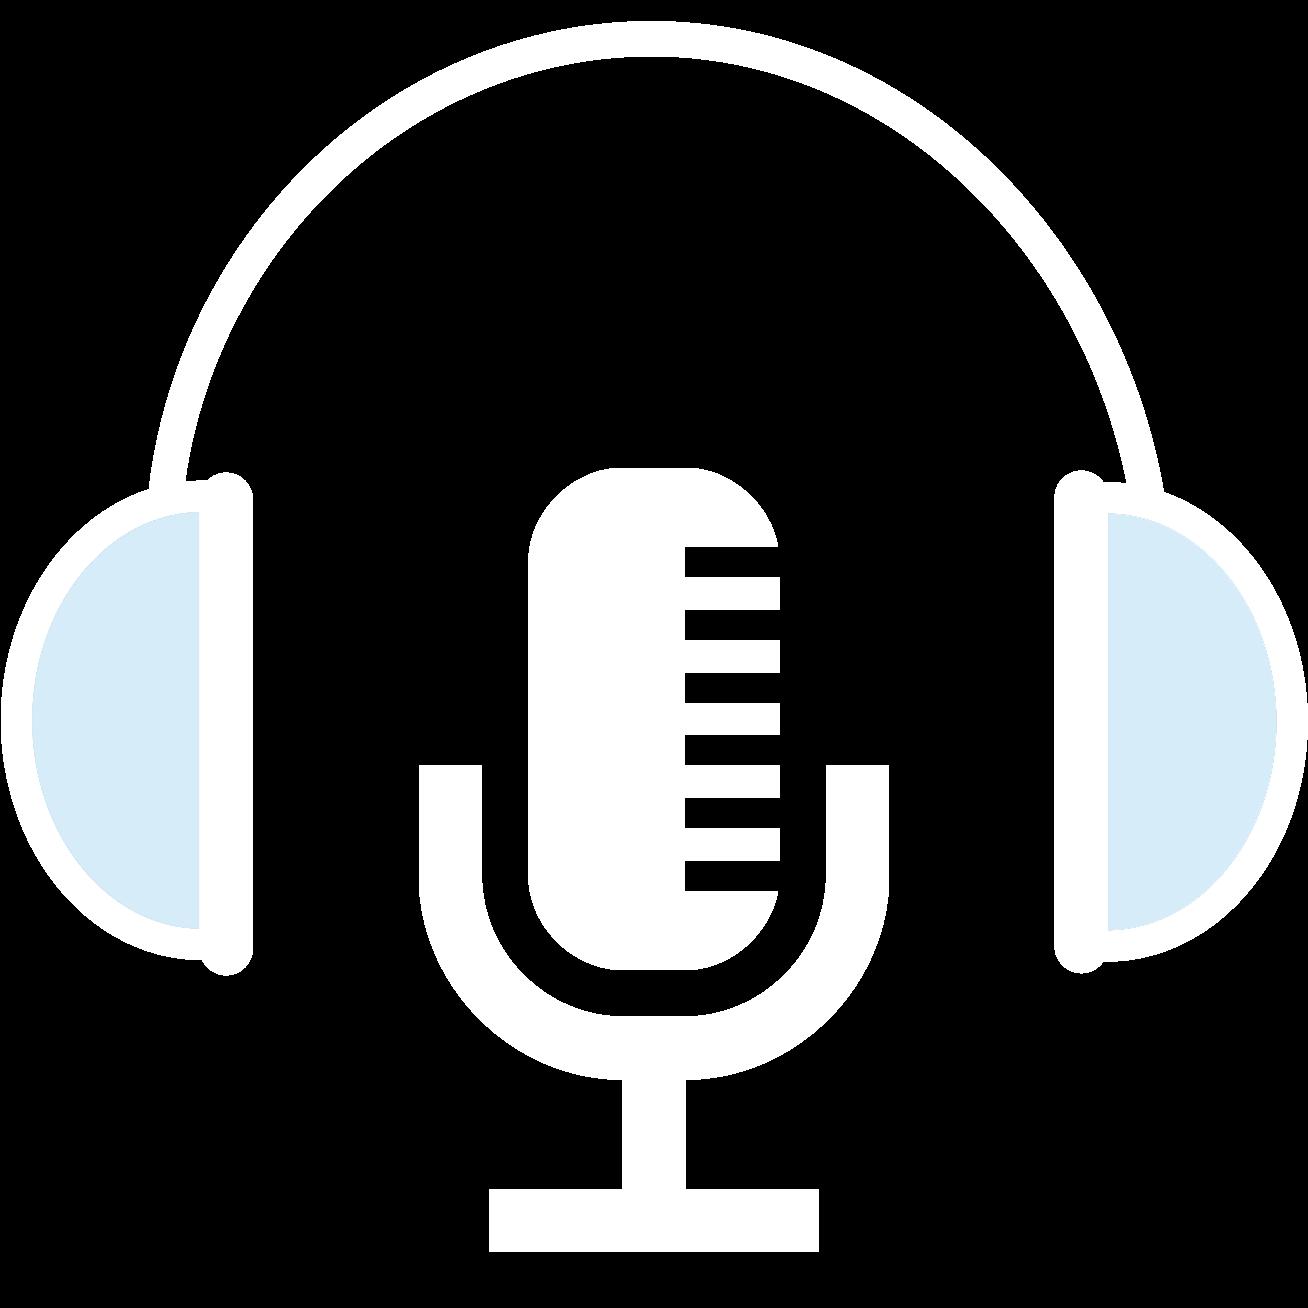 Jak zrobić podcast